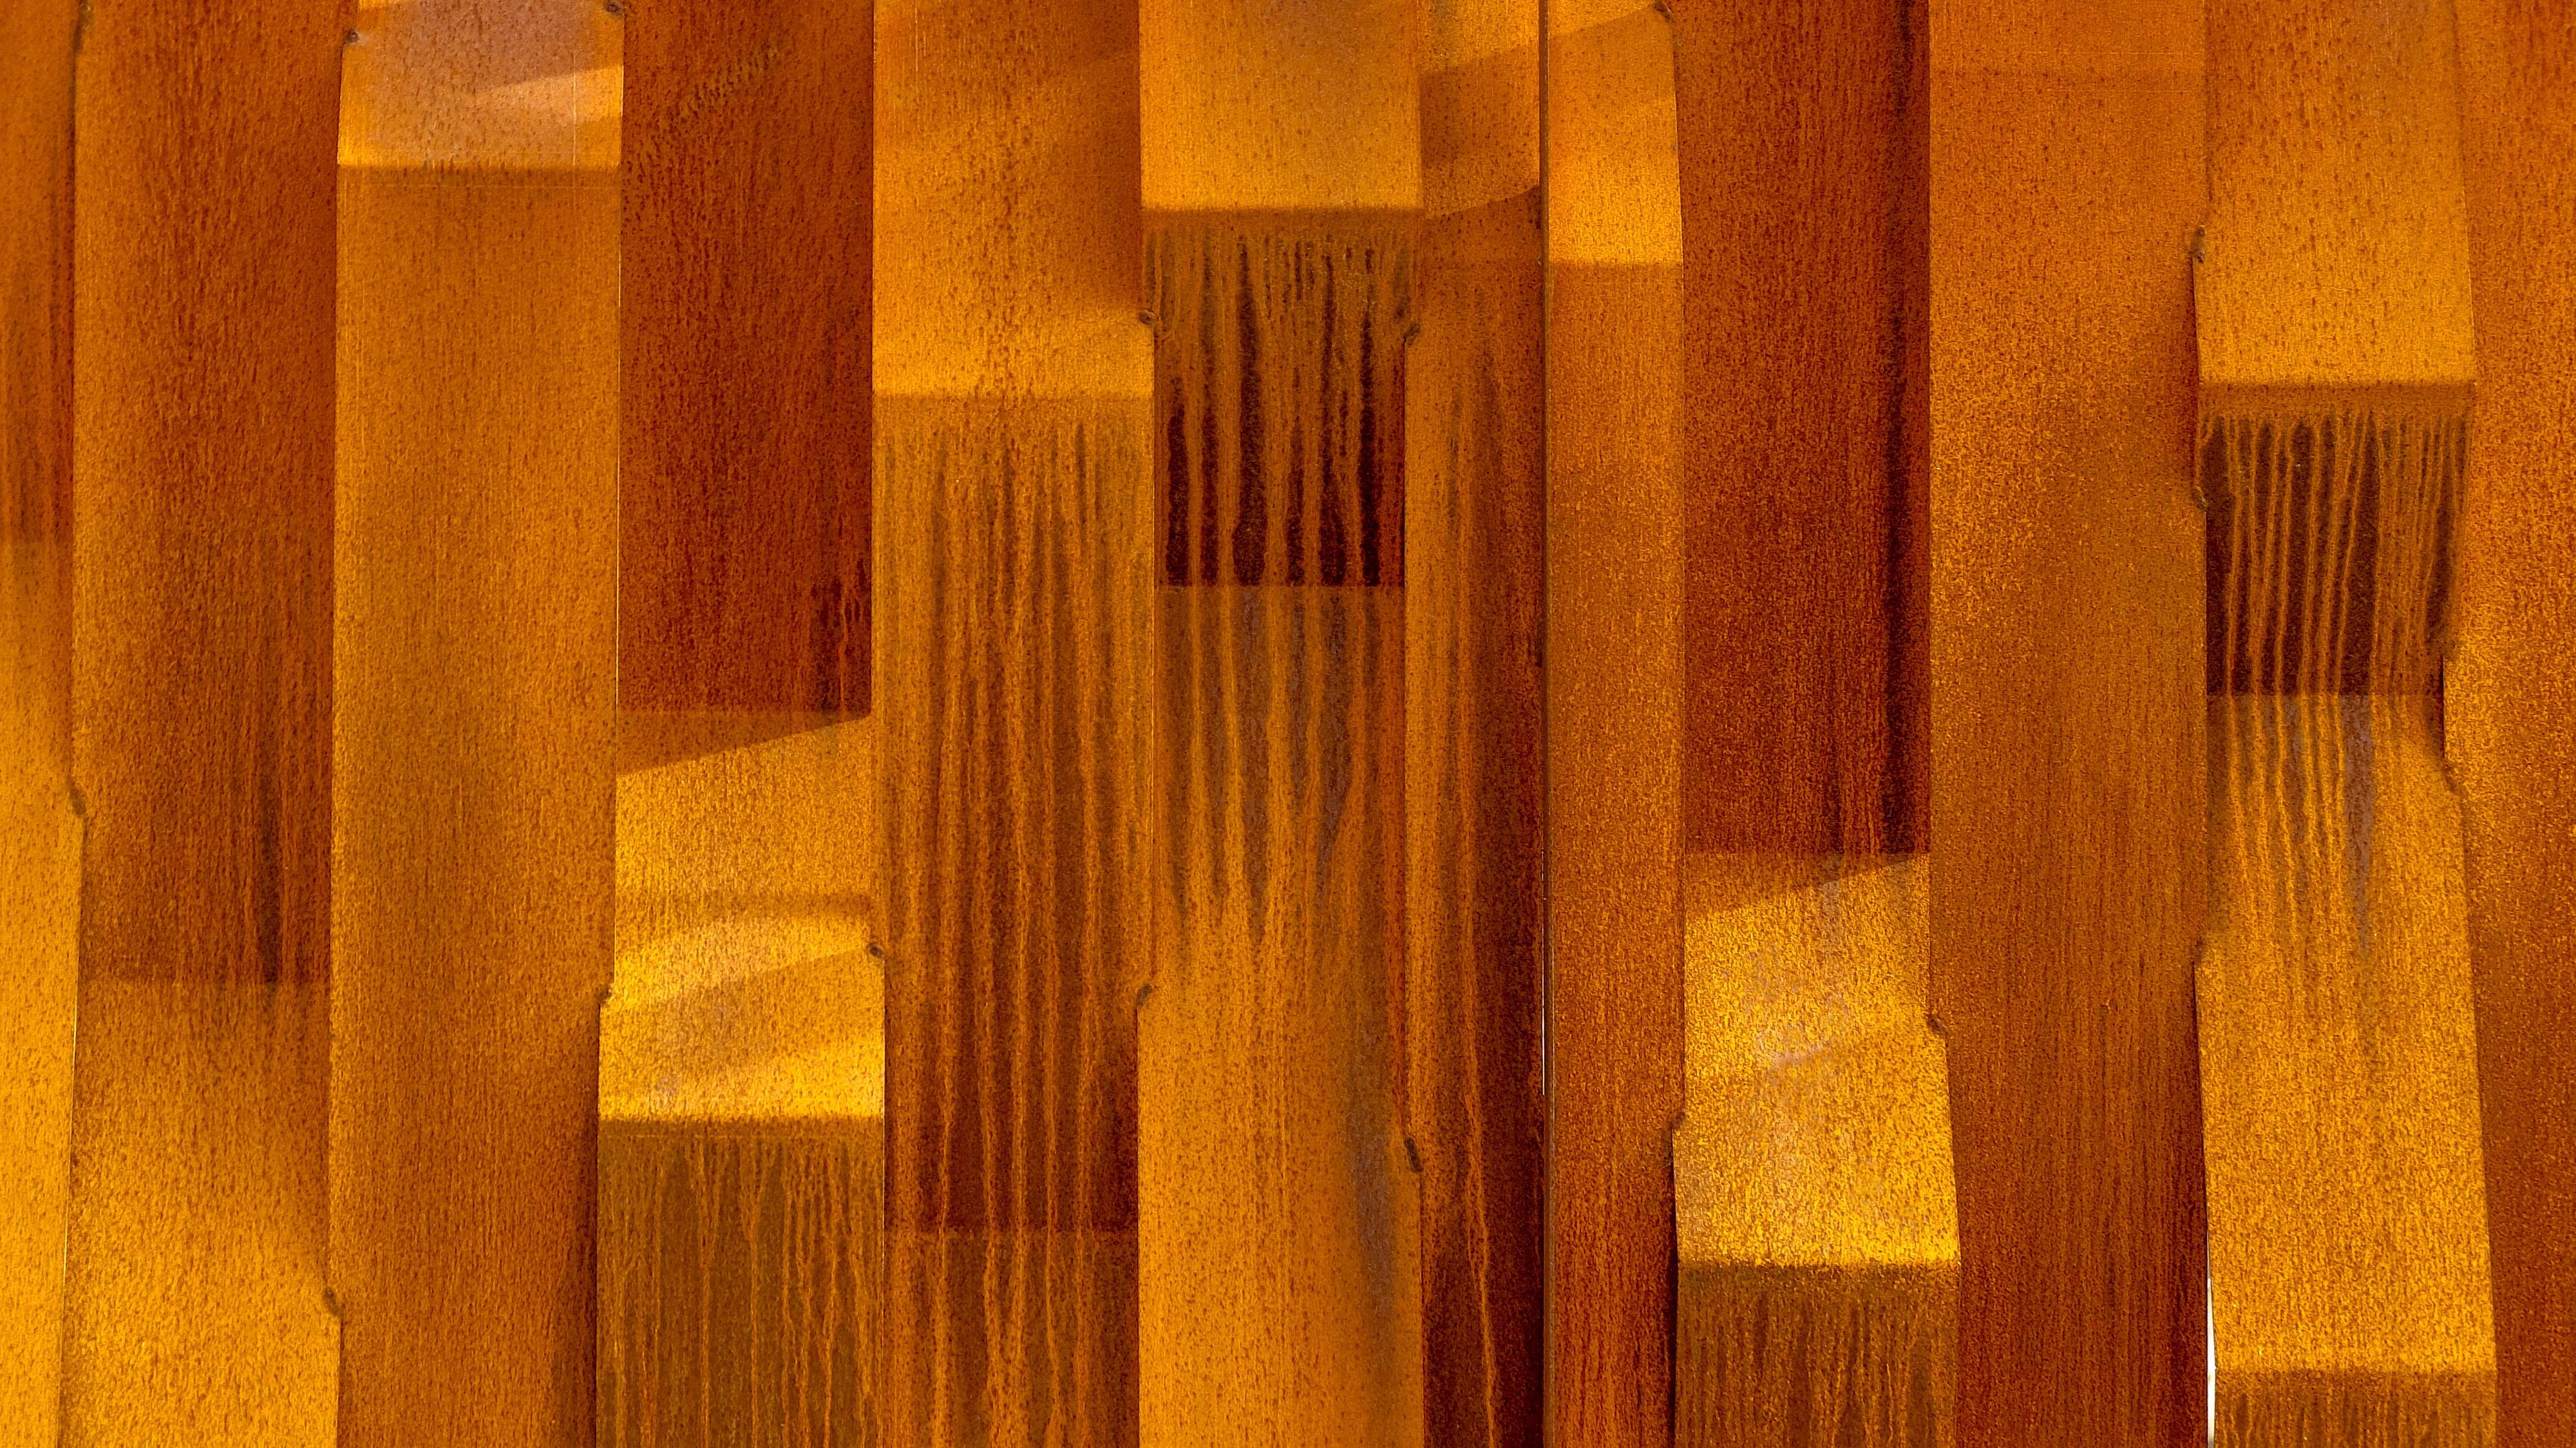 Fotos gratis : cerca, luz de sol, textura, piso, acero, moho, patrón ...